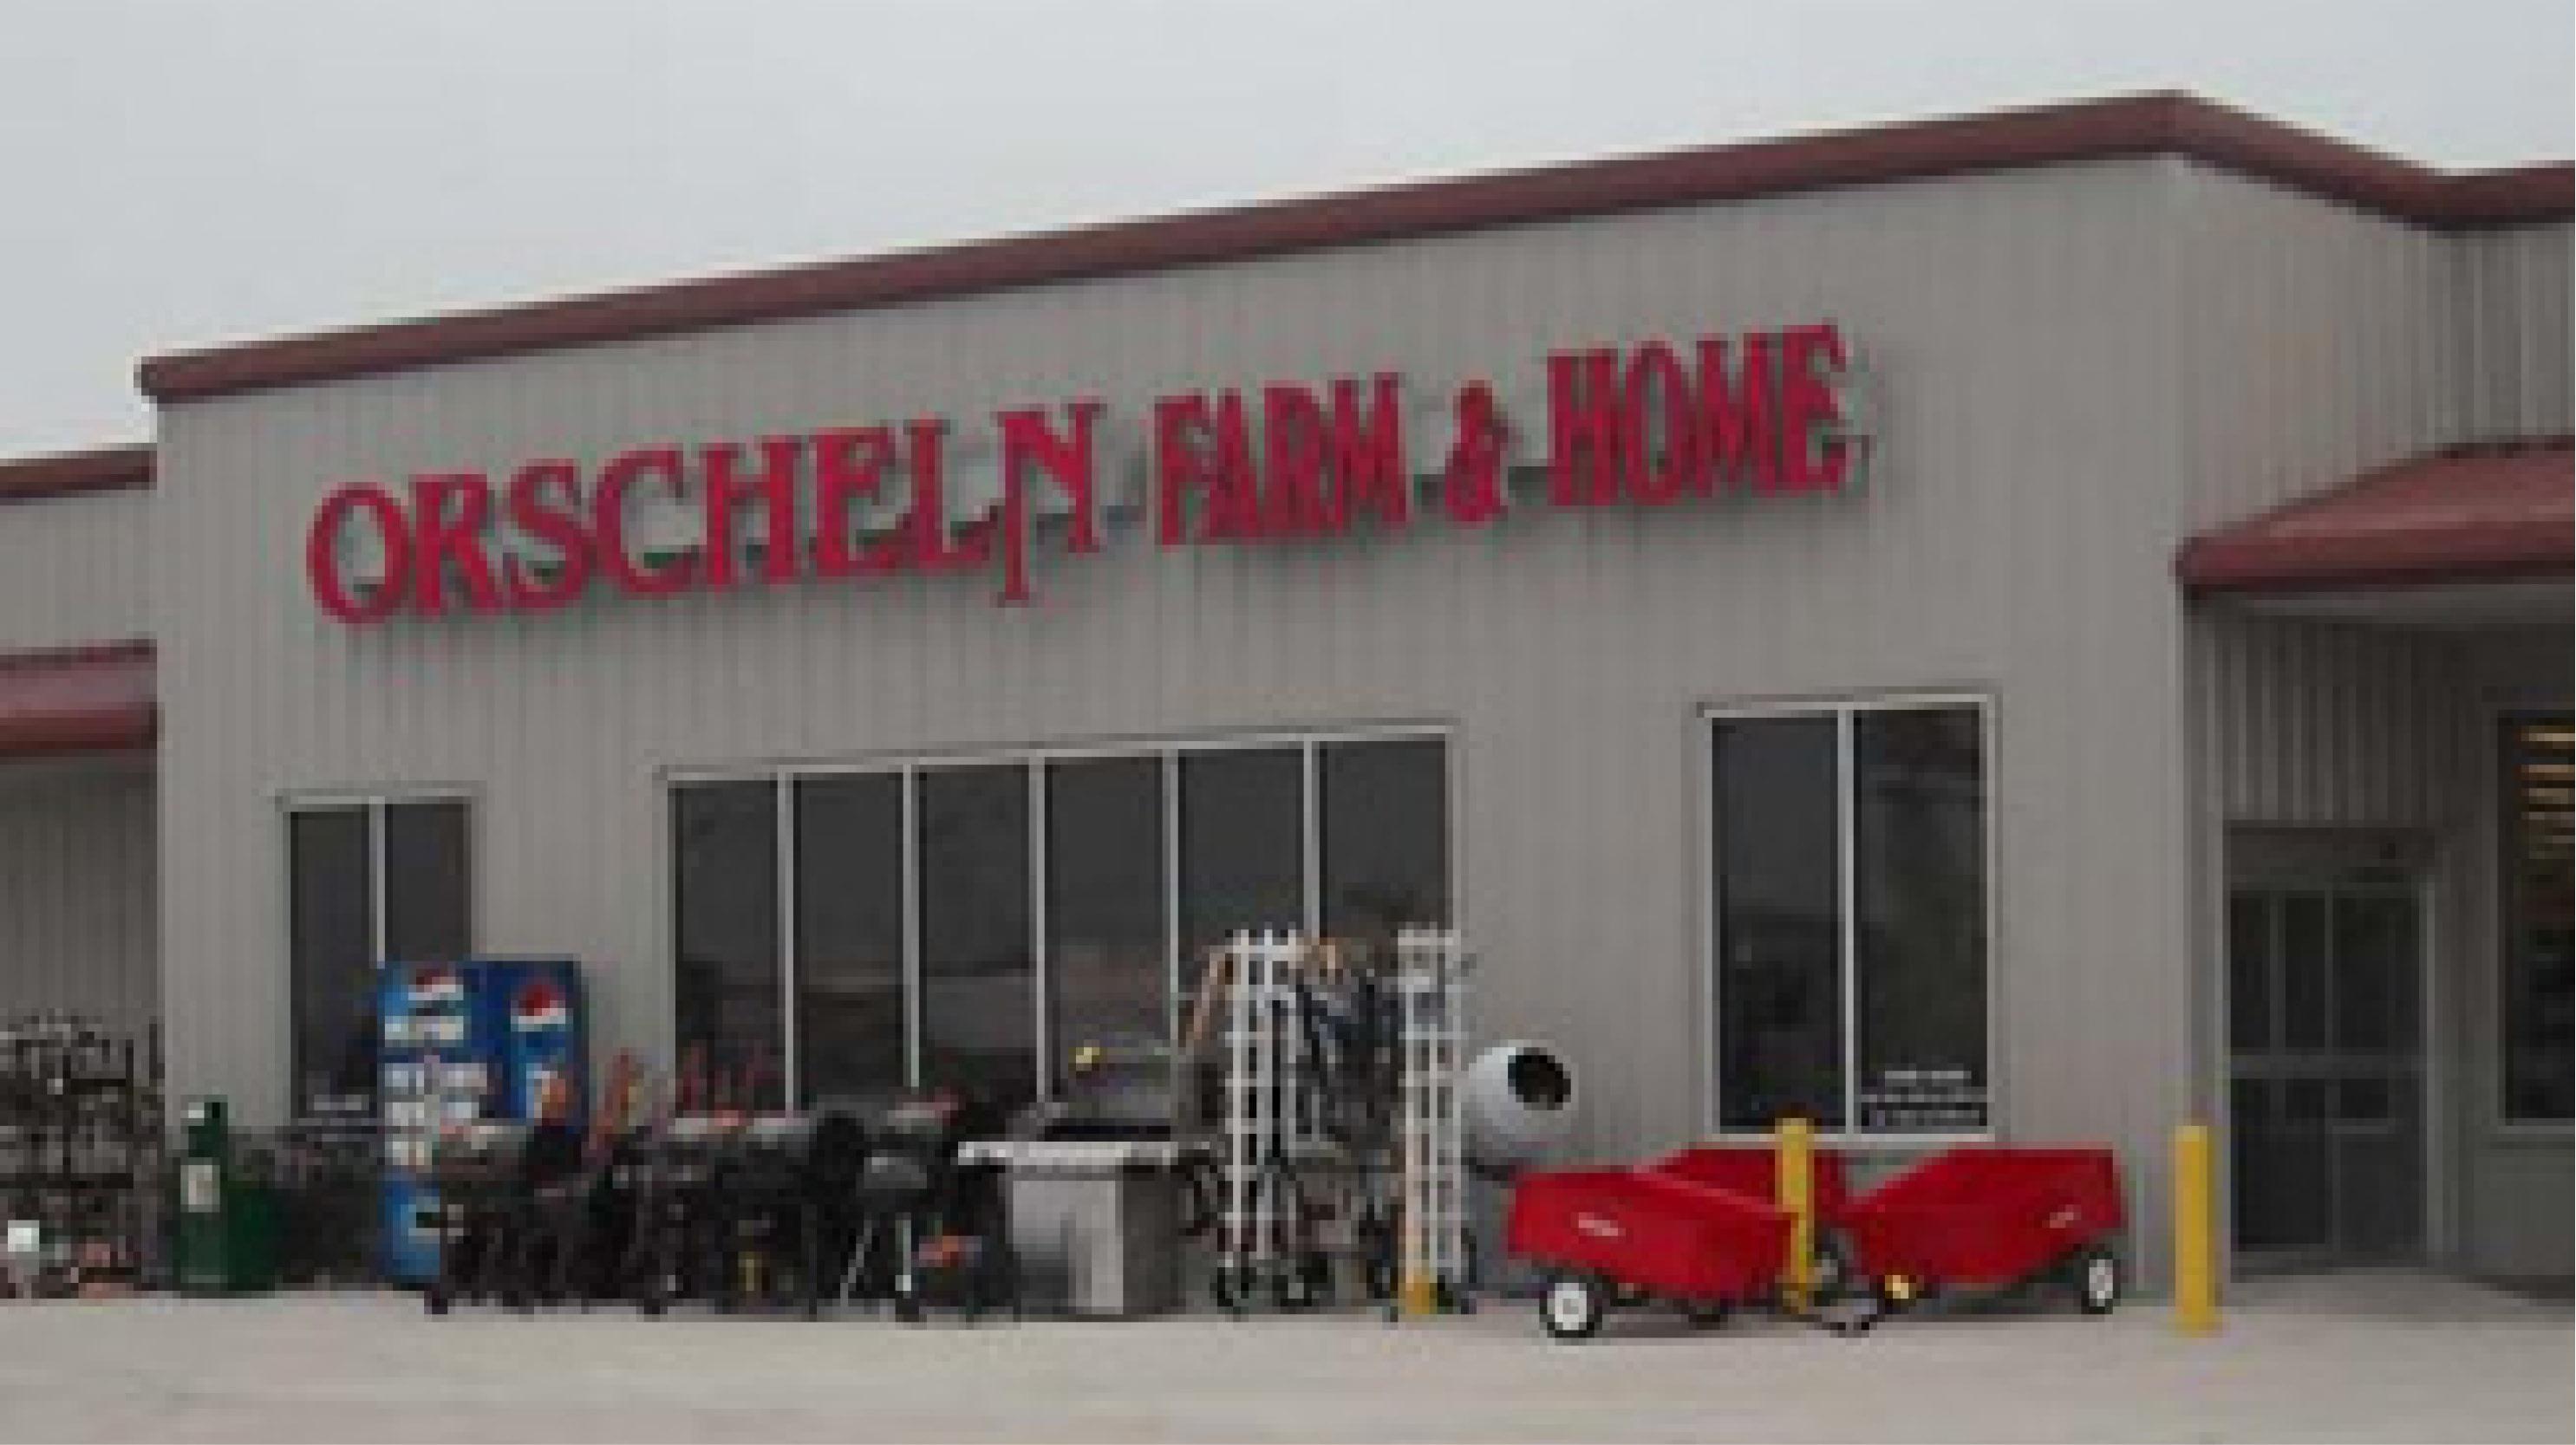 Front view of Orscheln Farm & Home Store in Fulton, Missouri 65251